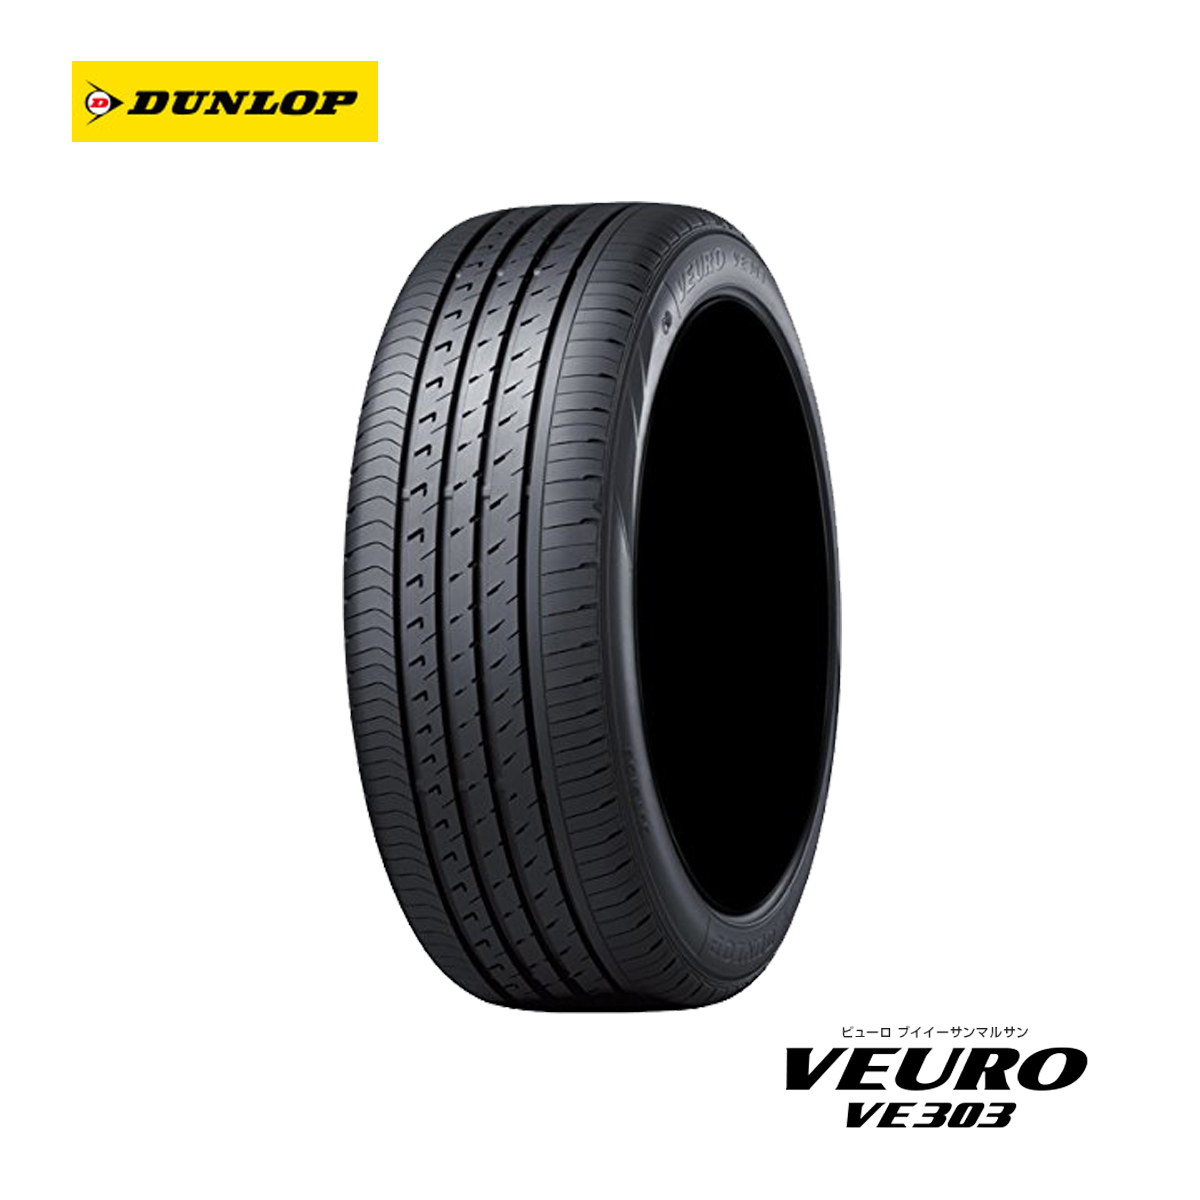 DUNLOP ダンロップ 吸音スポンジ搭載 プレミアム コンフォート 低燃費 サマータイヤ 4本 セット 18インチ 275/40R18 VEURO VE303 ビューロ